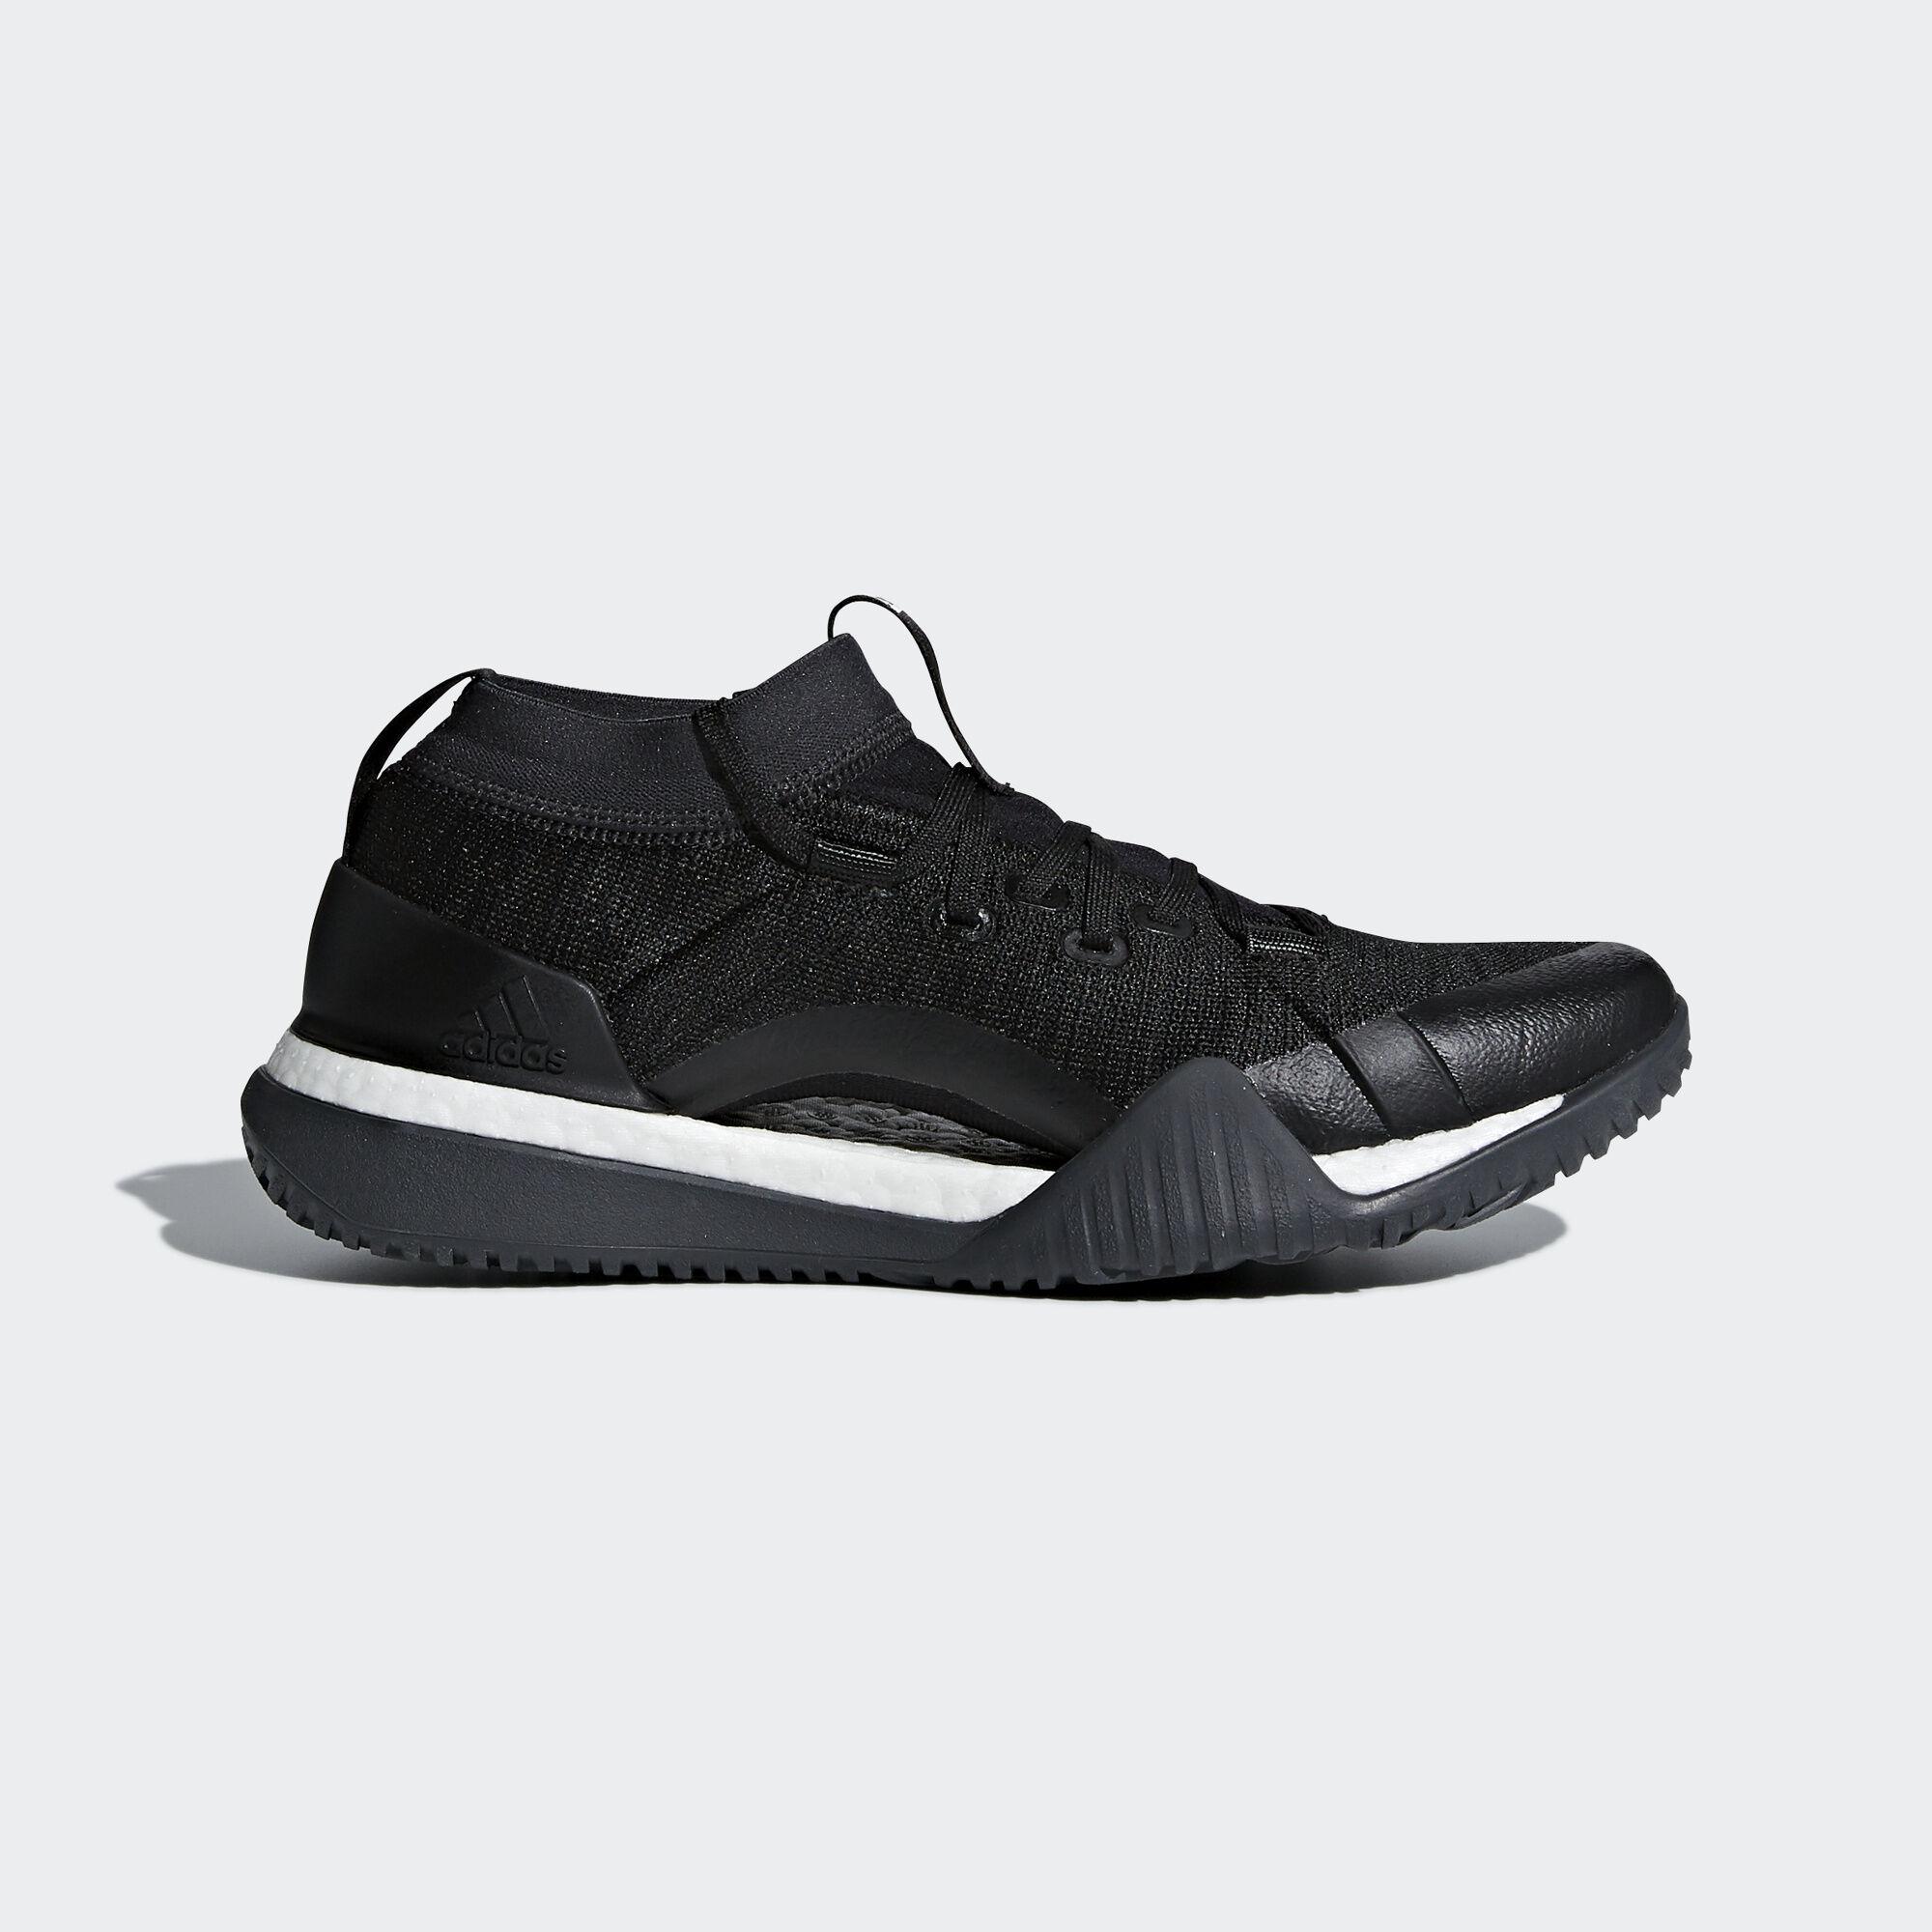 Pureboost X En Noir - Adidas S18 De Carbone d9ntV